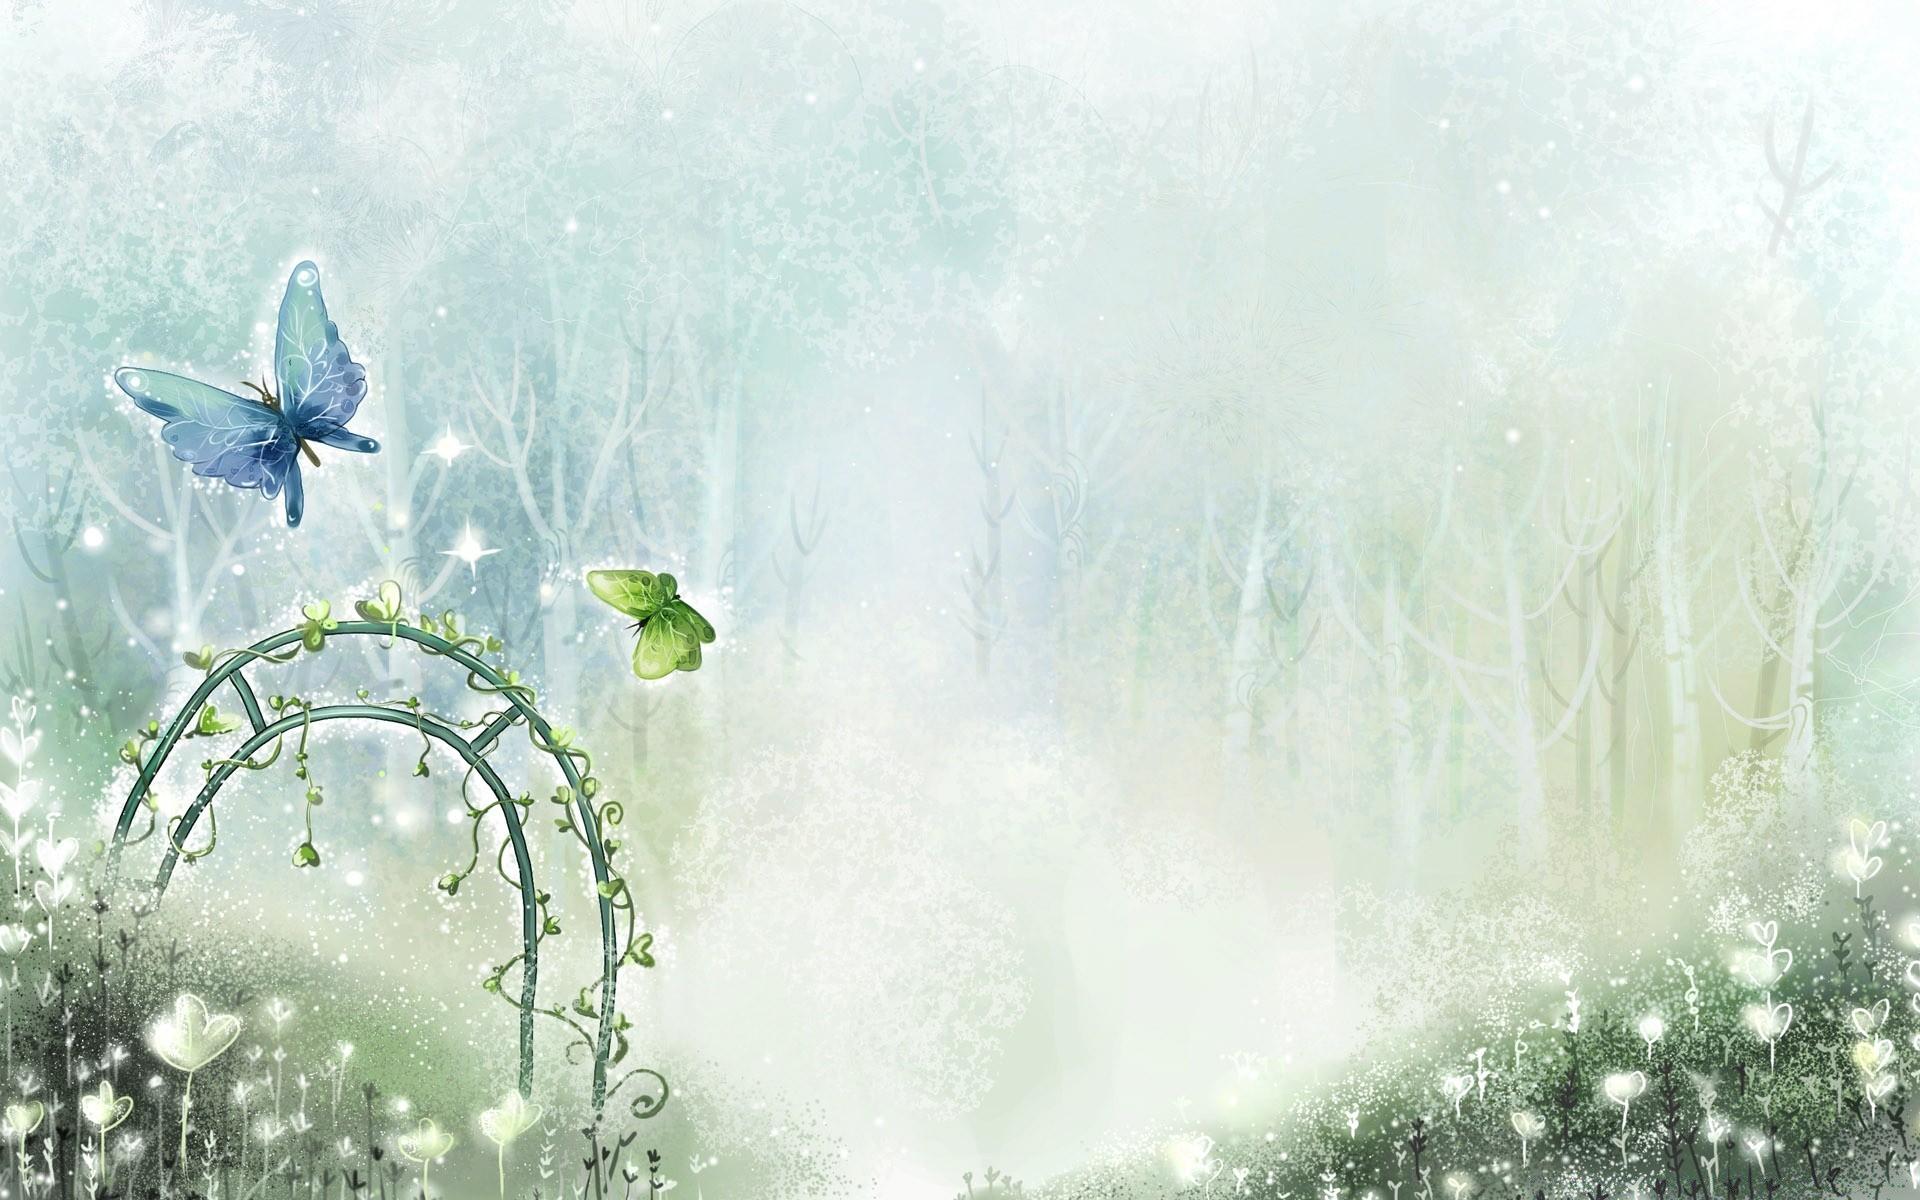 баню волшебная открытка шаблоны стихах дню